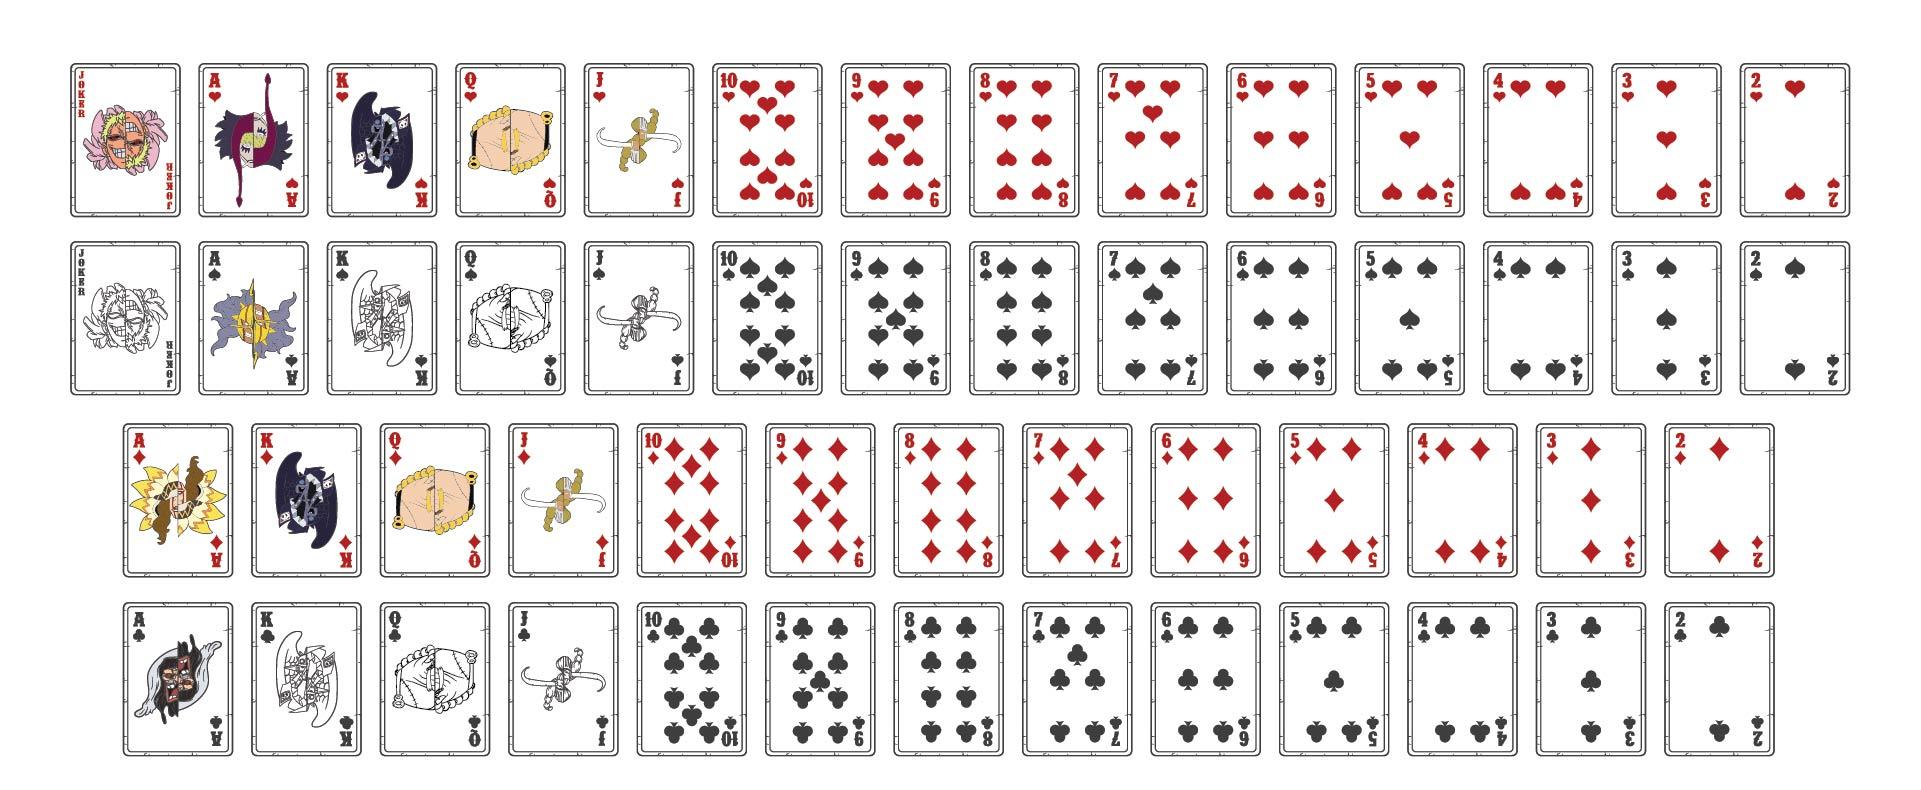 21 Best Deck Of Cards Printable - printablee.com In Deck Of Cards Template